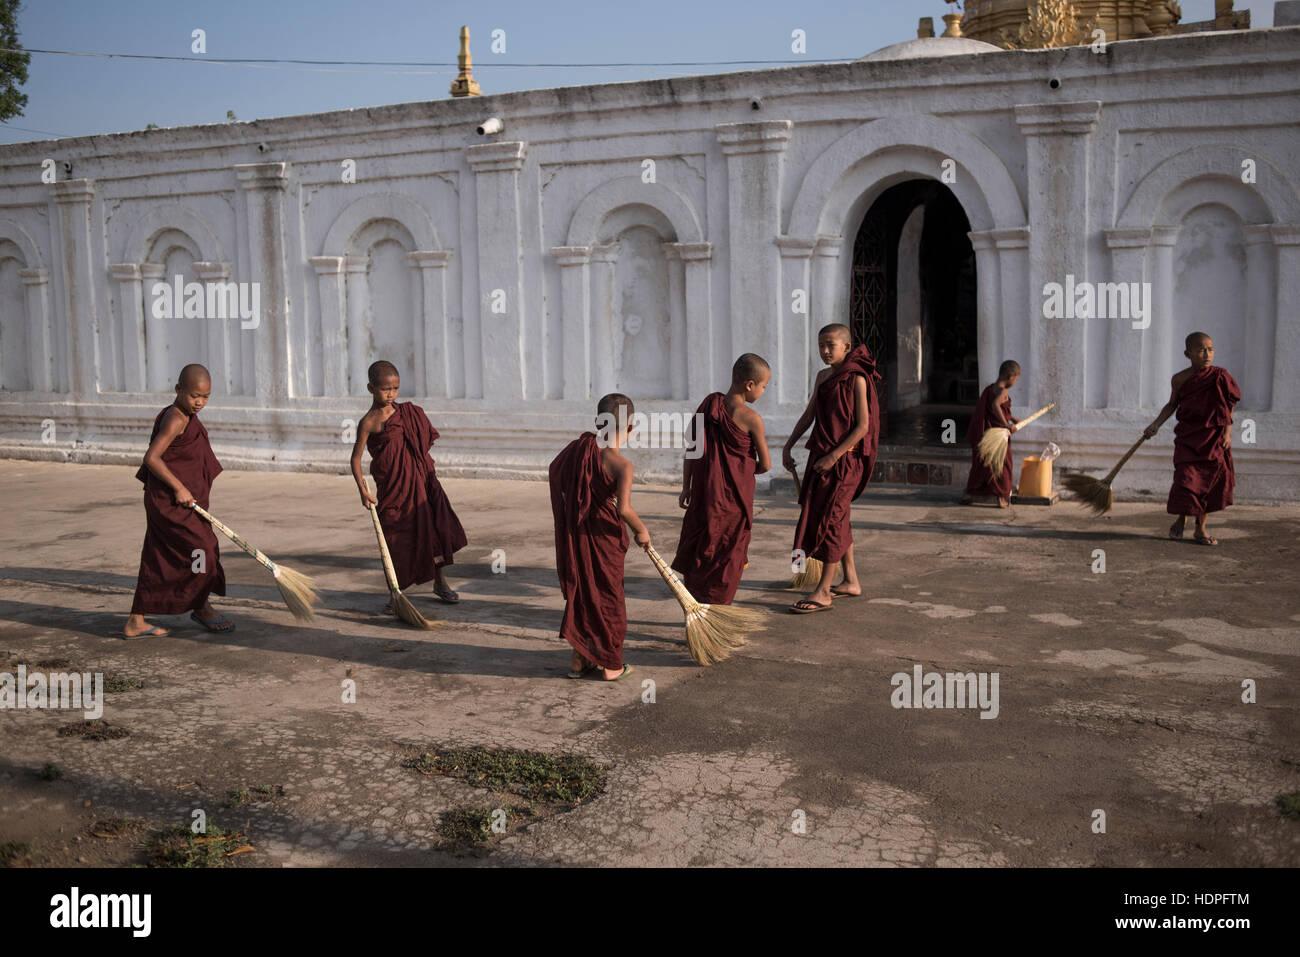 Young novice Buddhist monks sweeping around the grounds of the Shwe Yan Pyay Monastery in Nyaungshwe, Myanmar. - Stock Image